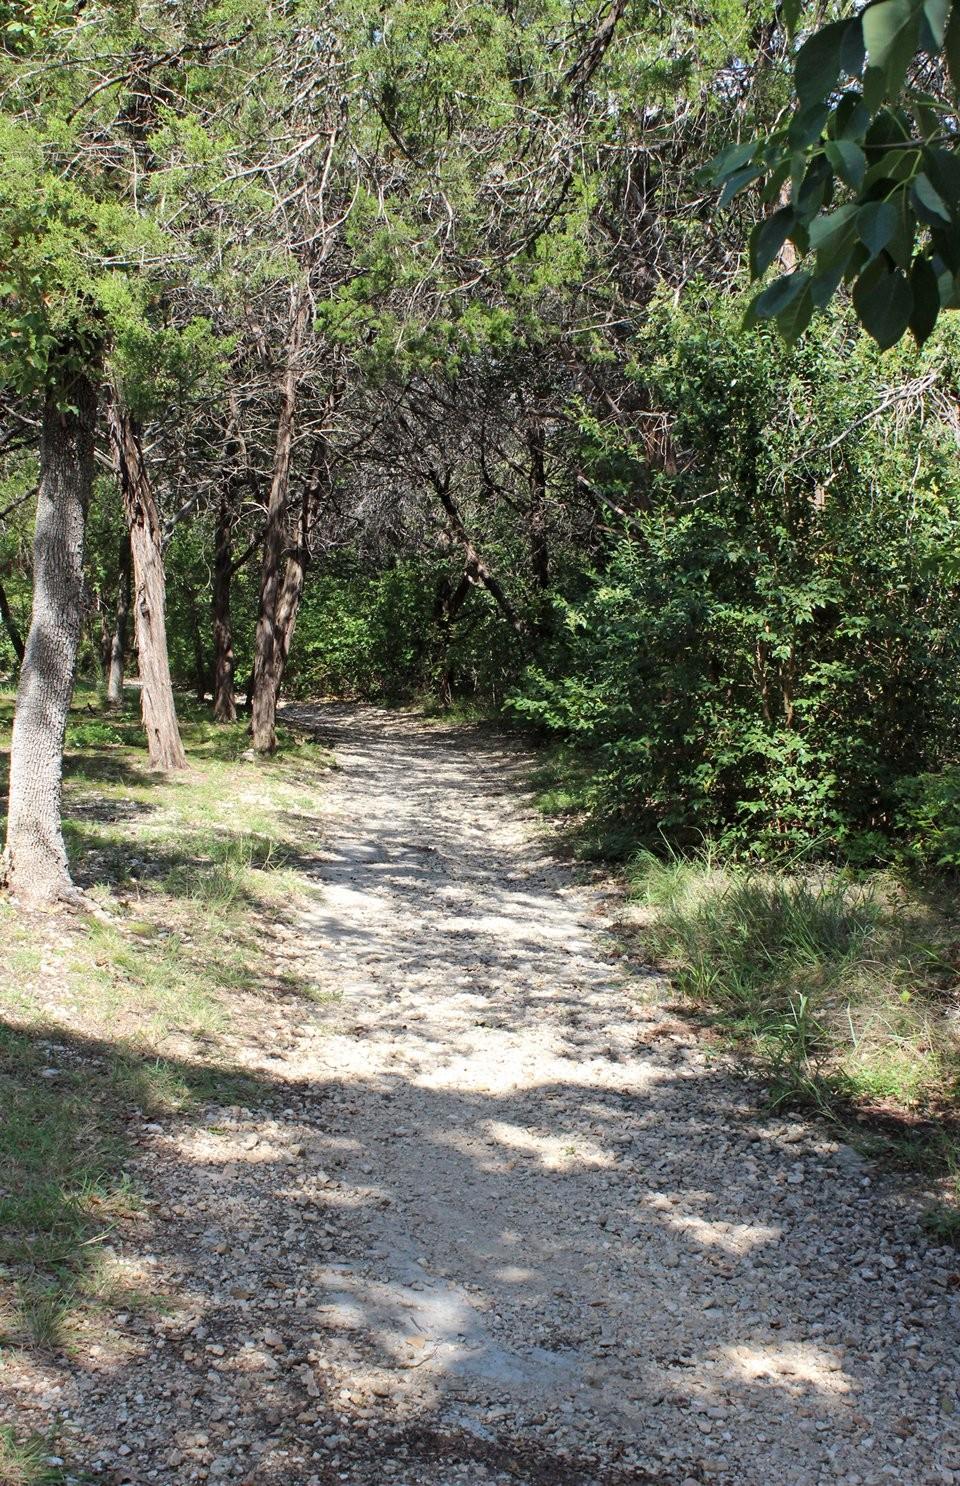 hike01-community-209233.jpg